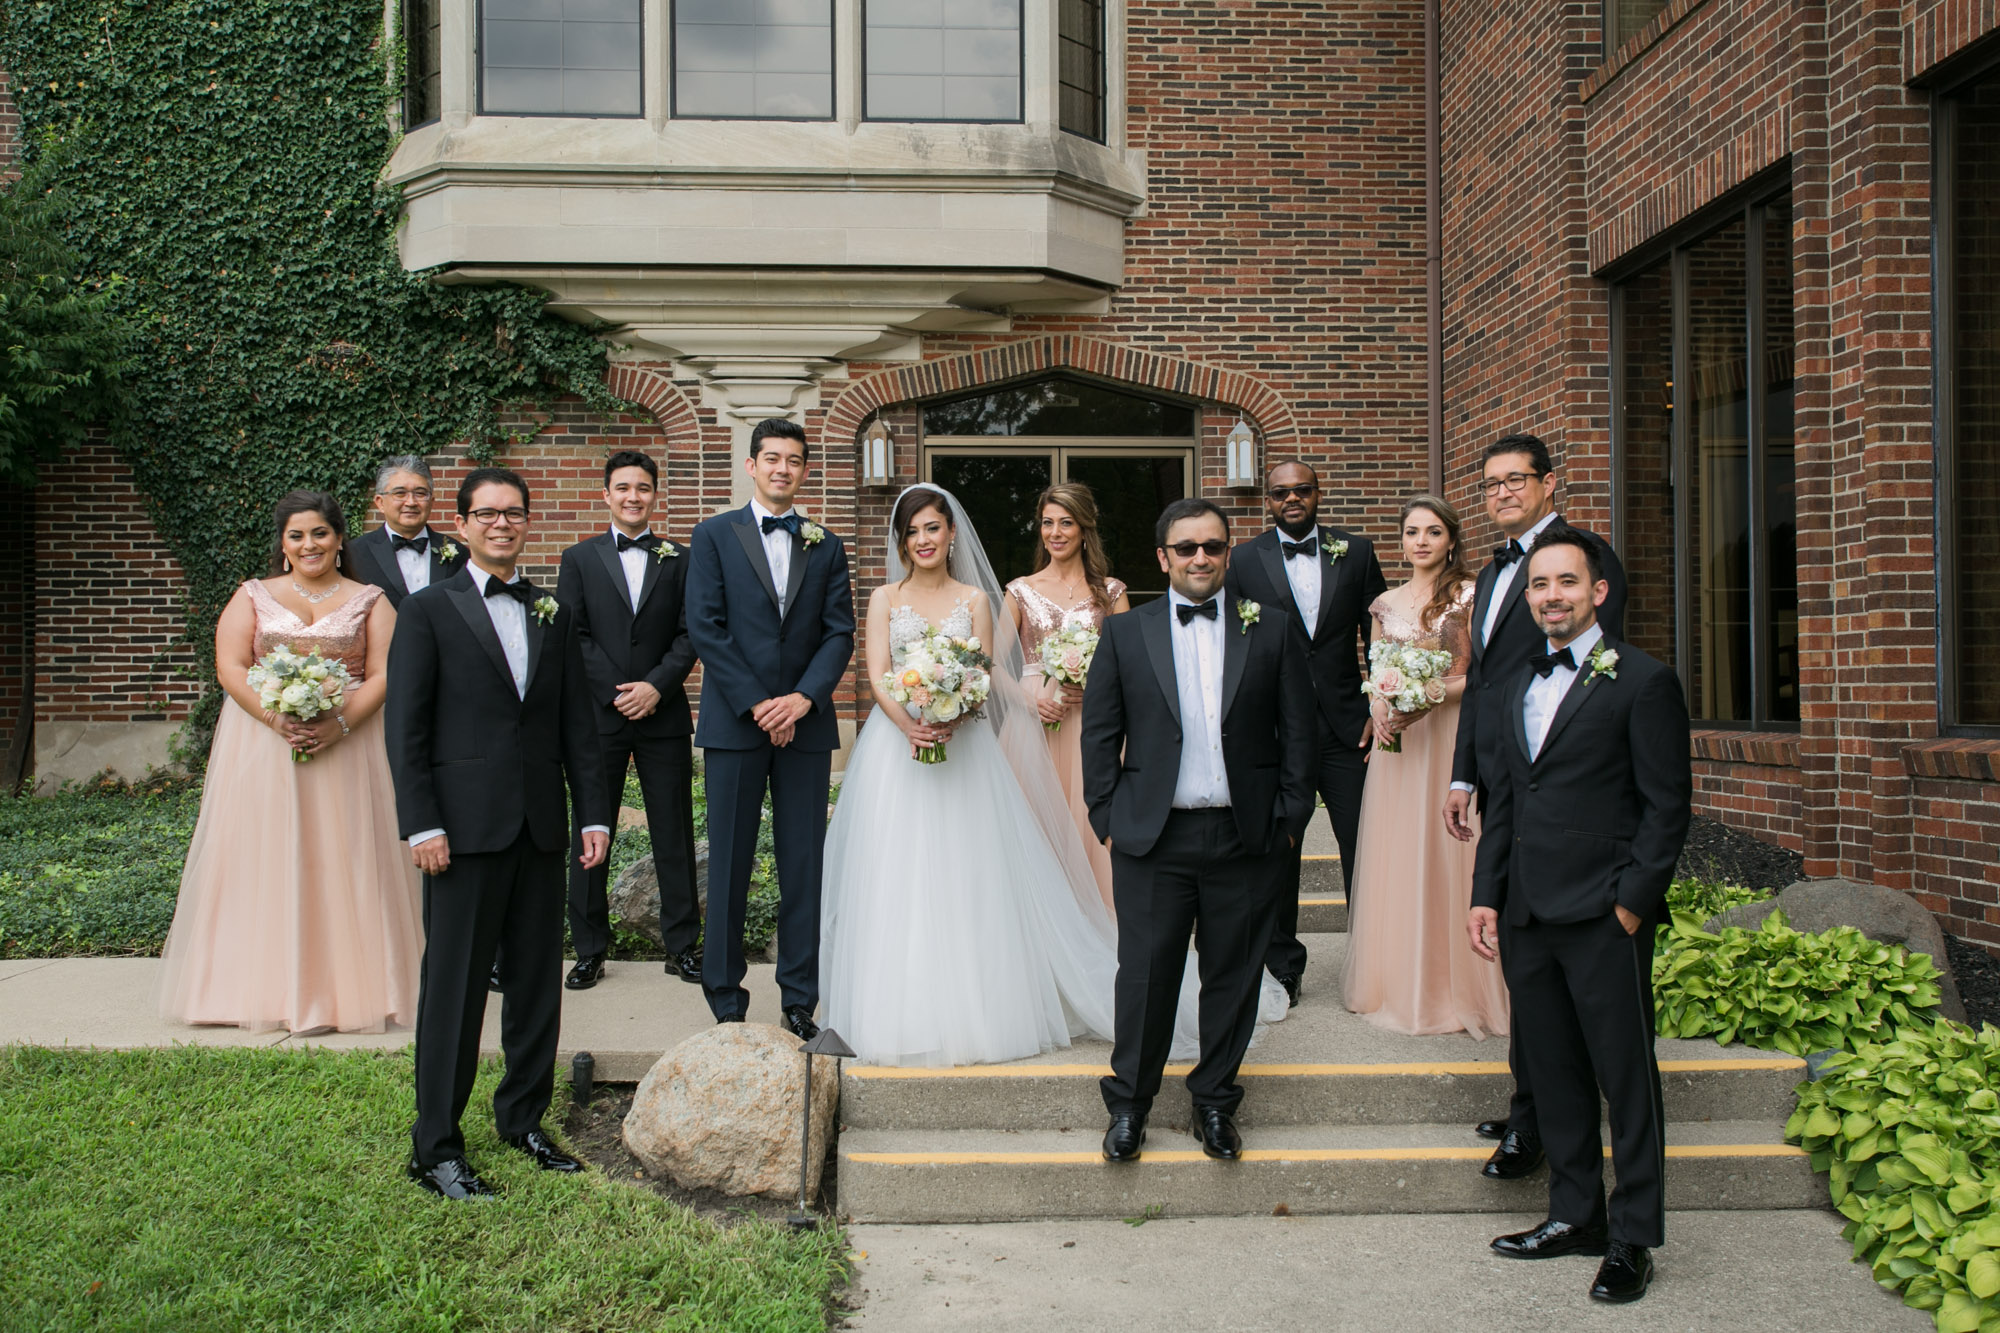 sylvania-country-club-wedding-photos-57.jpg